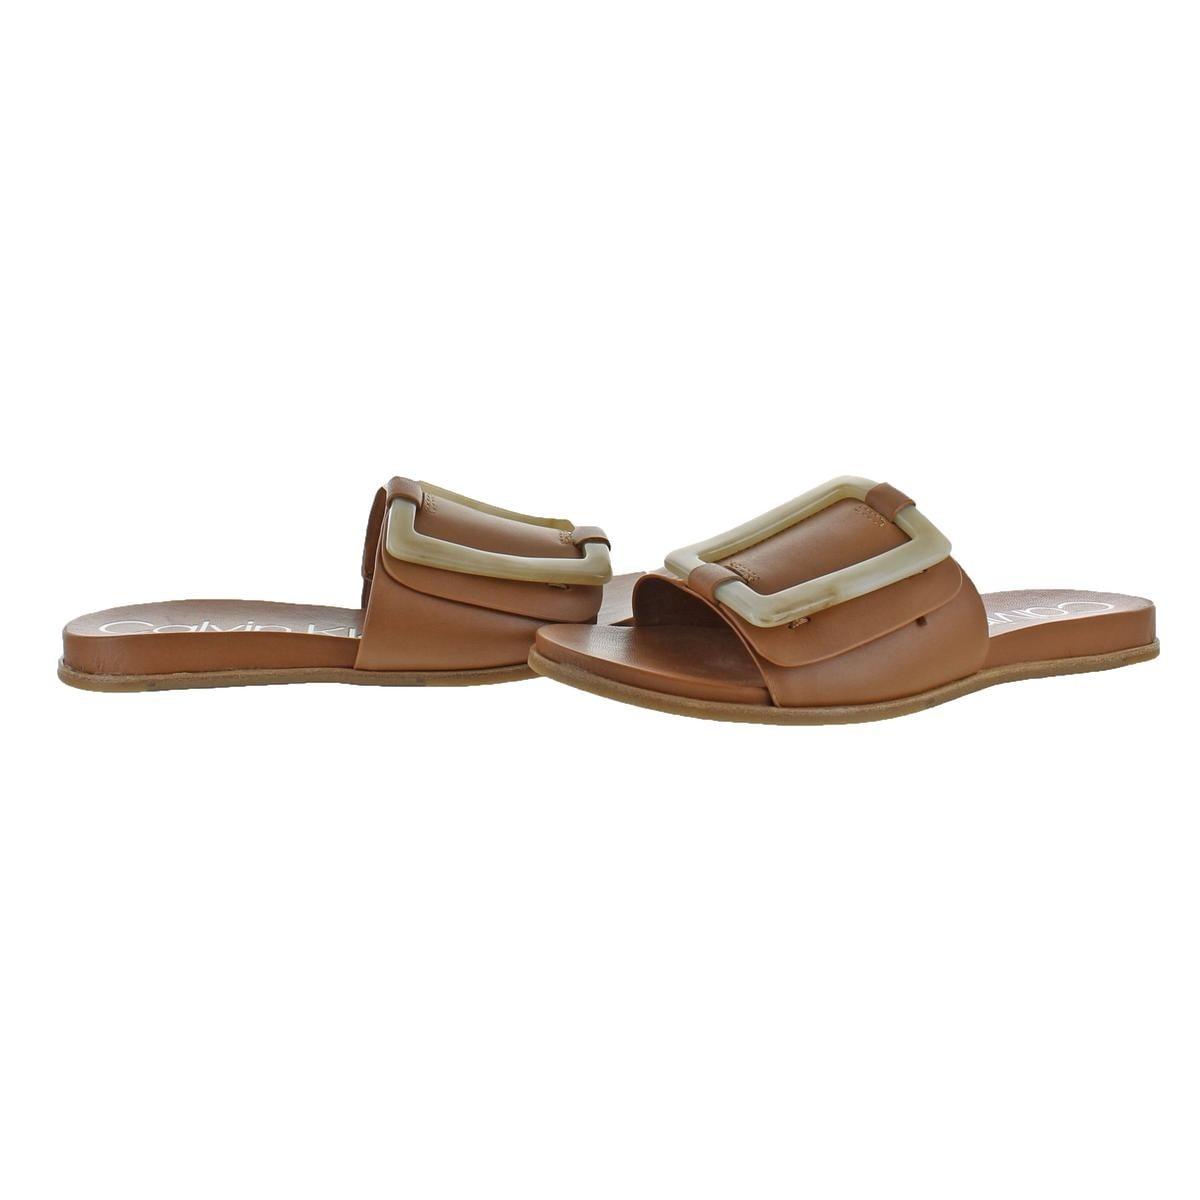 1d7525497cf1 Shop Calvin Klein Womens Patreece Slide Sandals Slide Summer - Free  Shipping Today - Overstock - 22312601